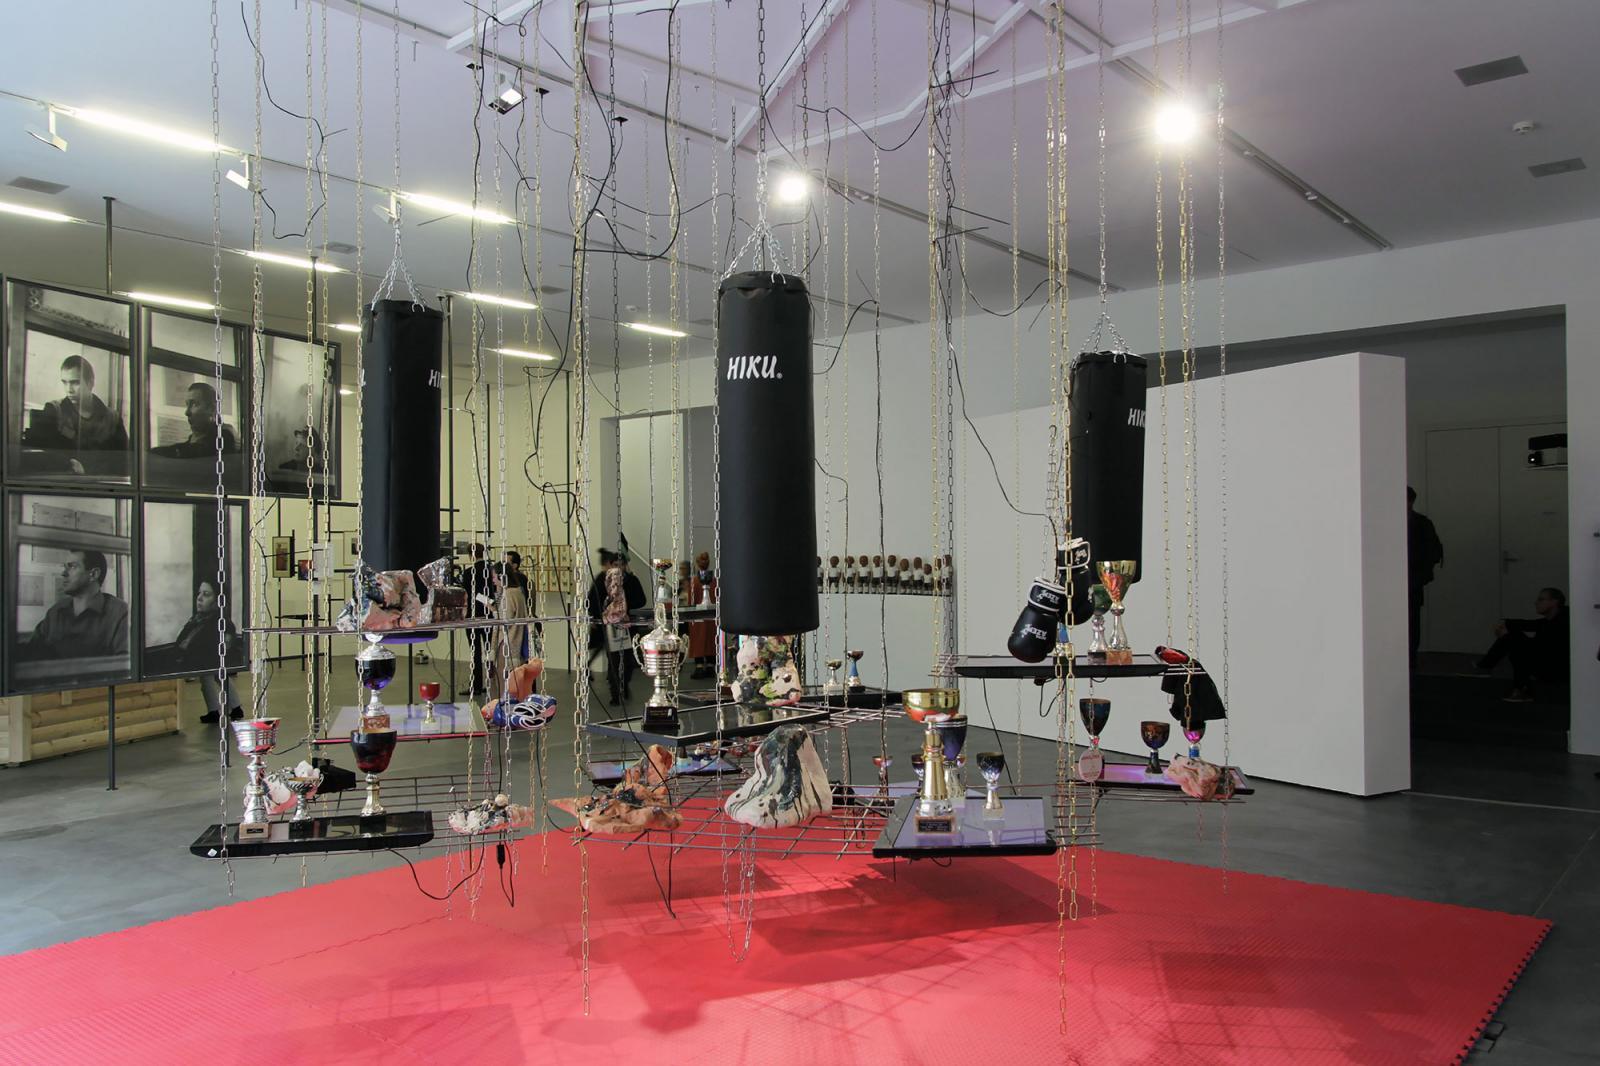 Matyáš Chochola Installation view atLöwenbräukunst Photo: Manifesta 11 / Wolfgang Träger